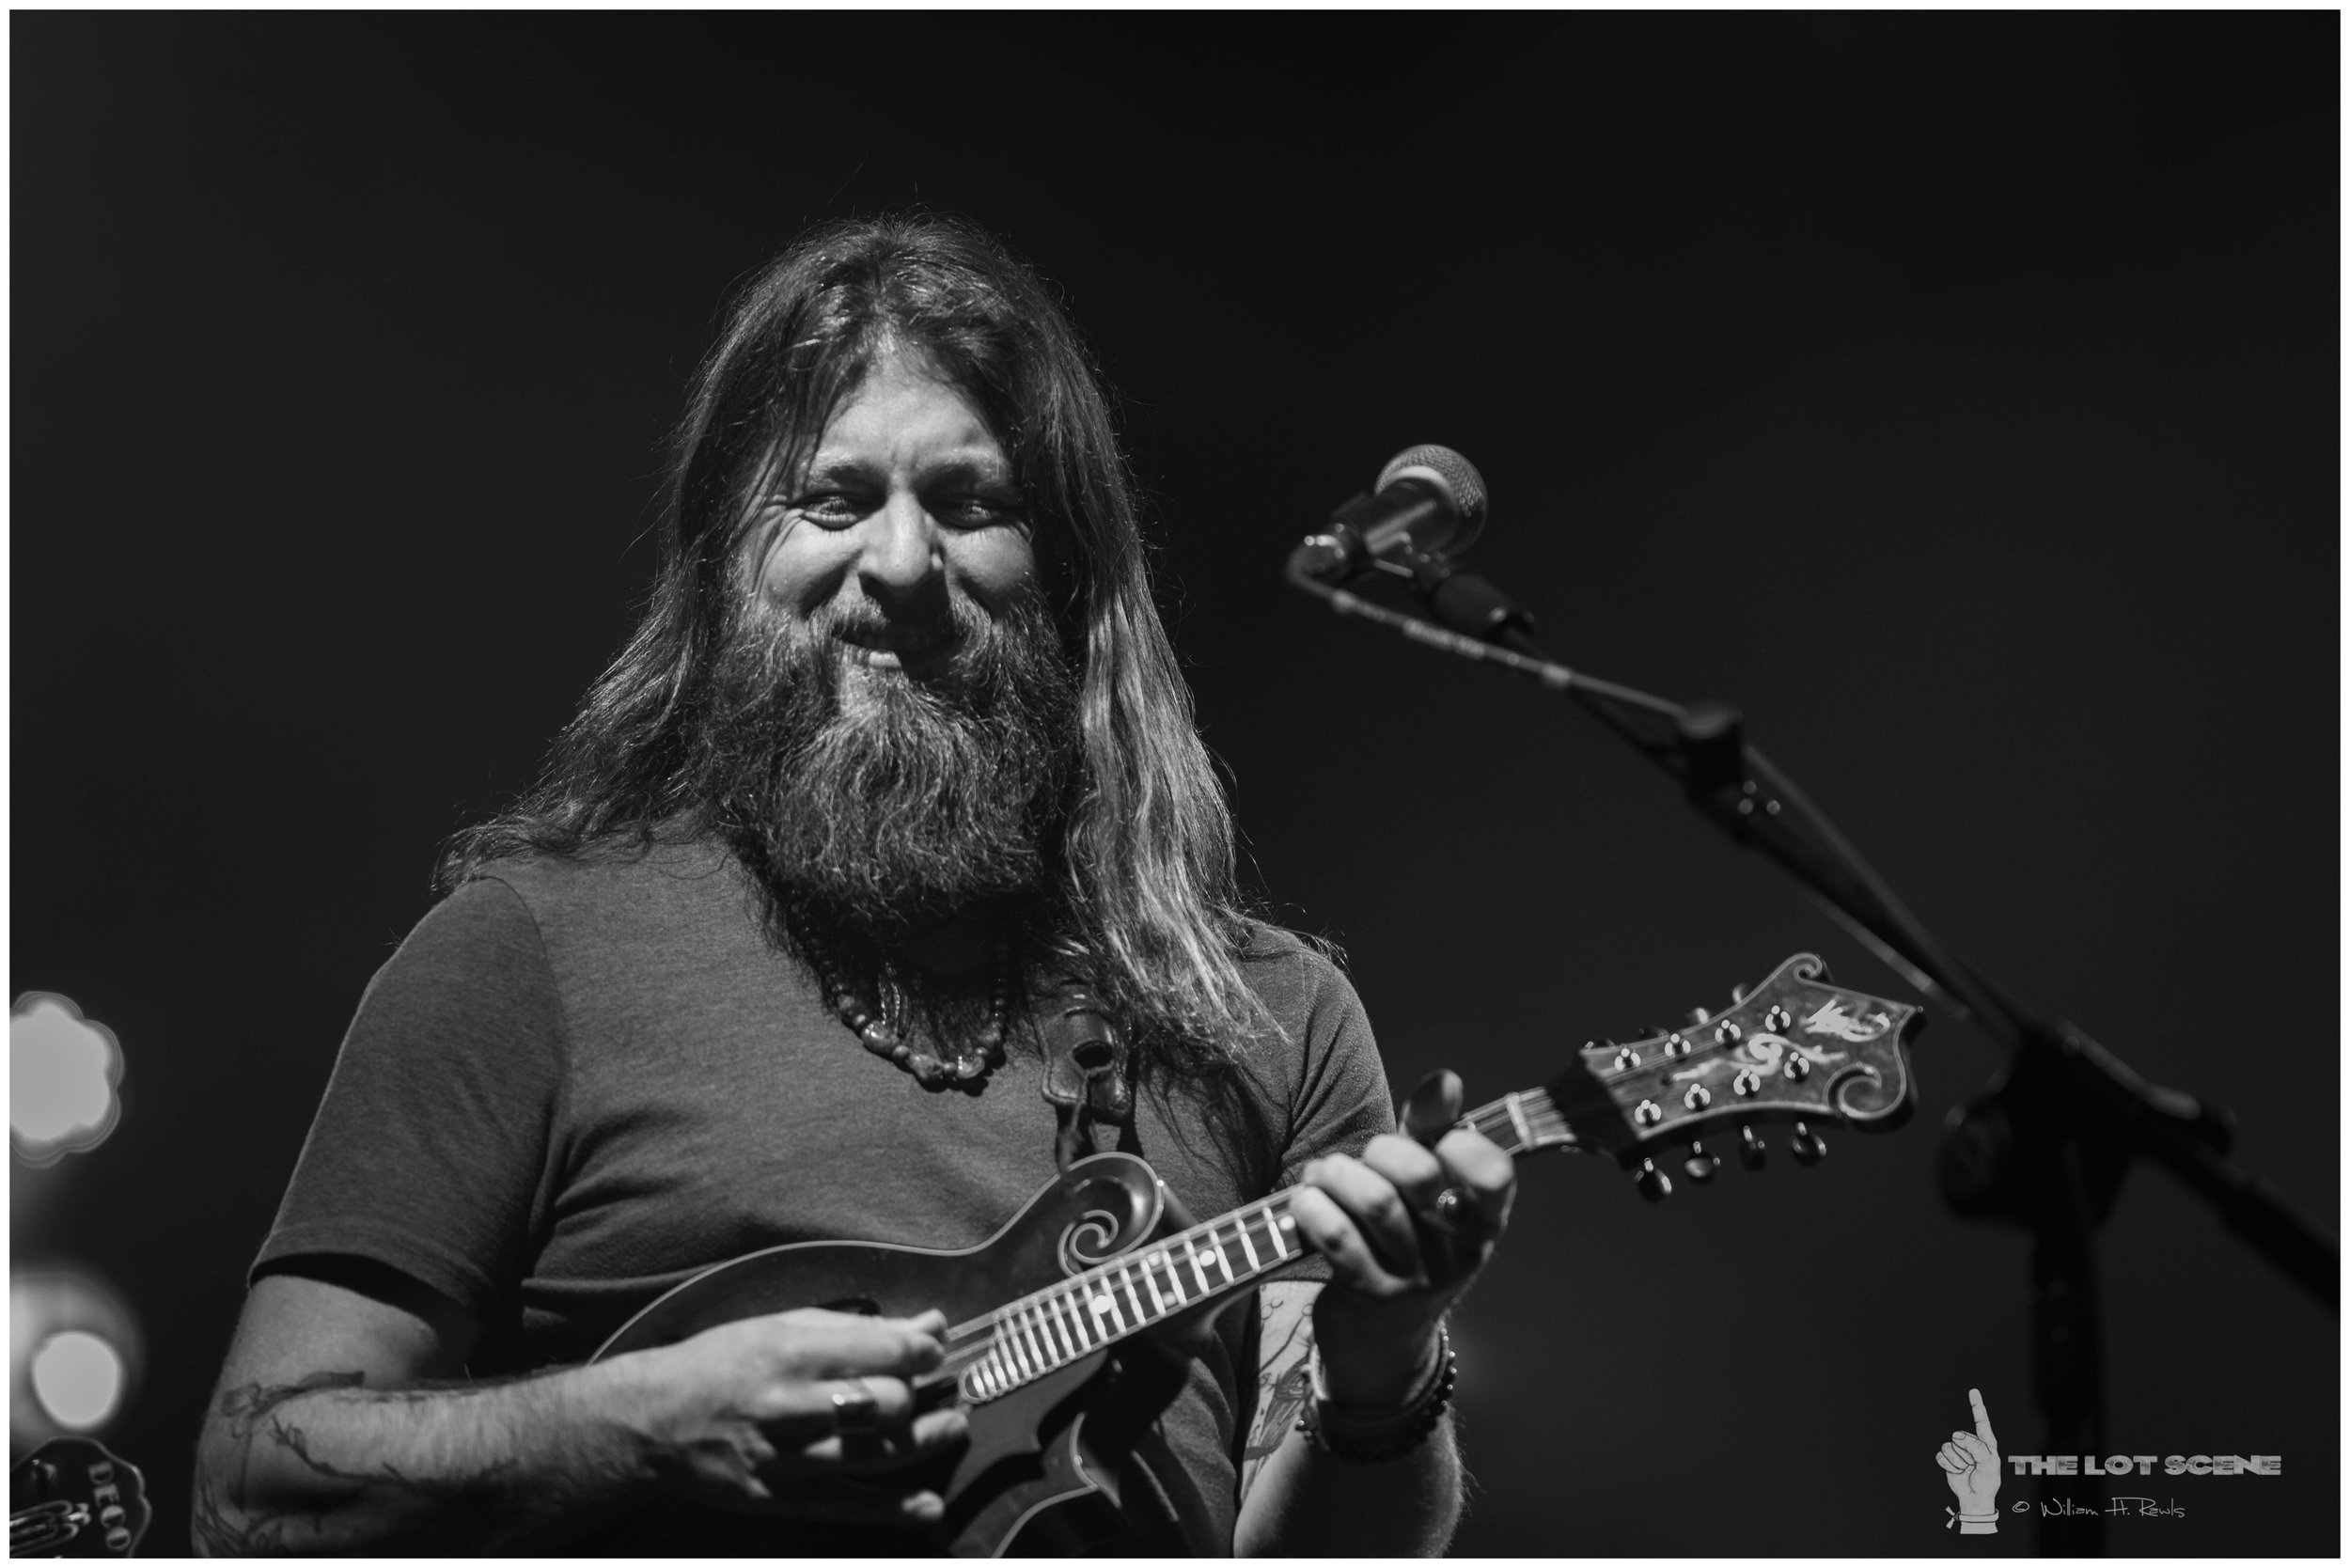 Greensky Bluegrass at The Anthem DC - February 2 2019 - 2.jpg